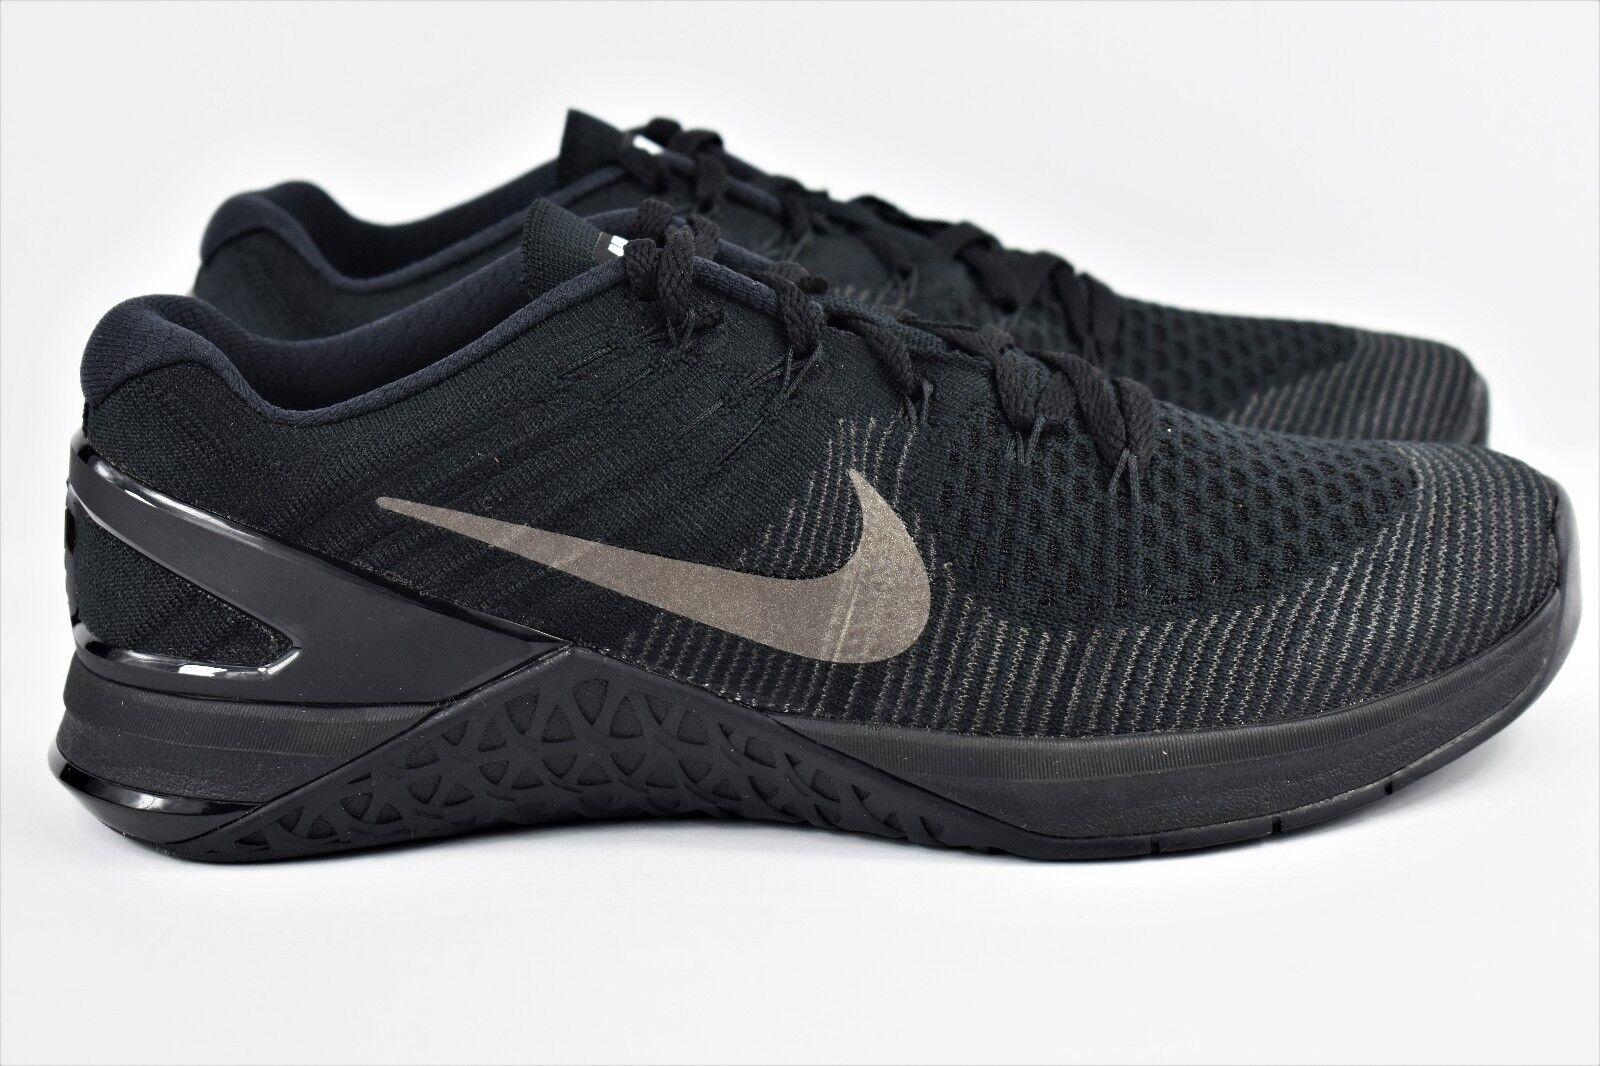 Nike metcon dsx flyknit scarpe Uomo 8 nero formazione scarpe flyknit crossfit 852930 004 94d69a